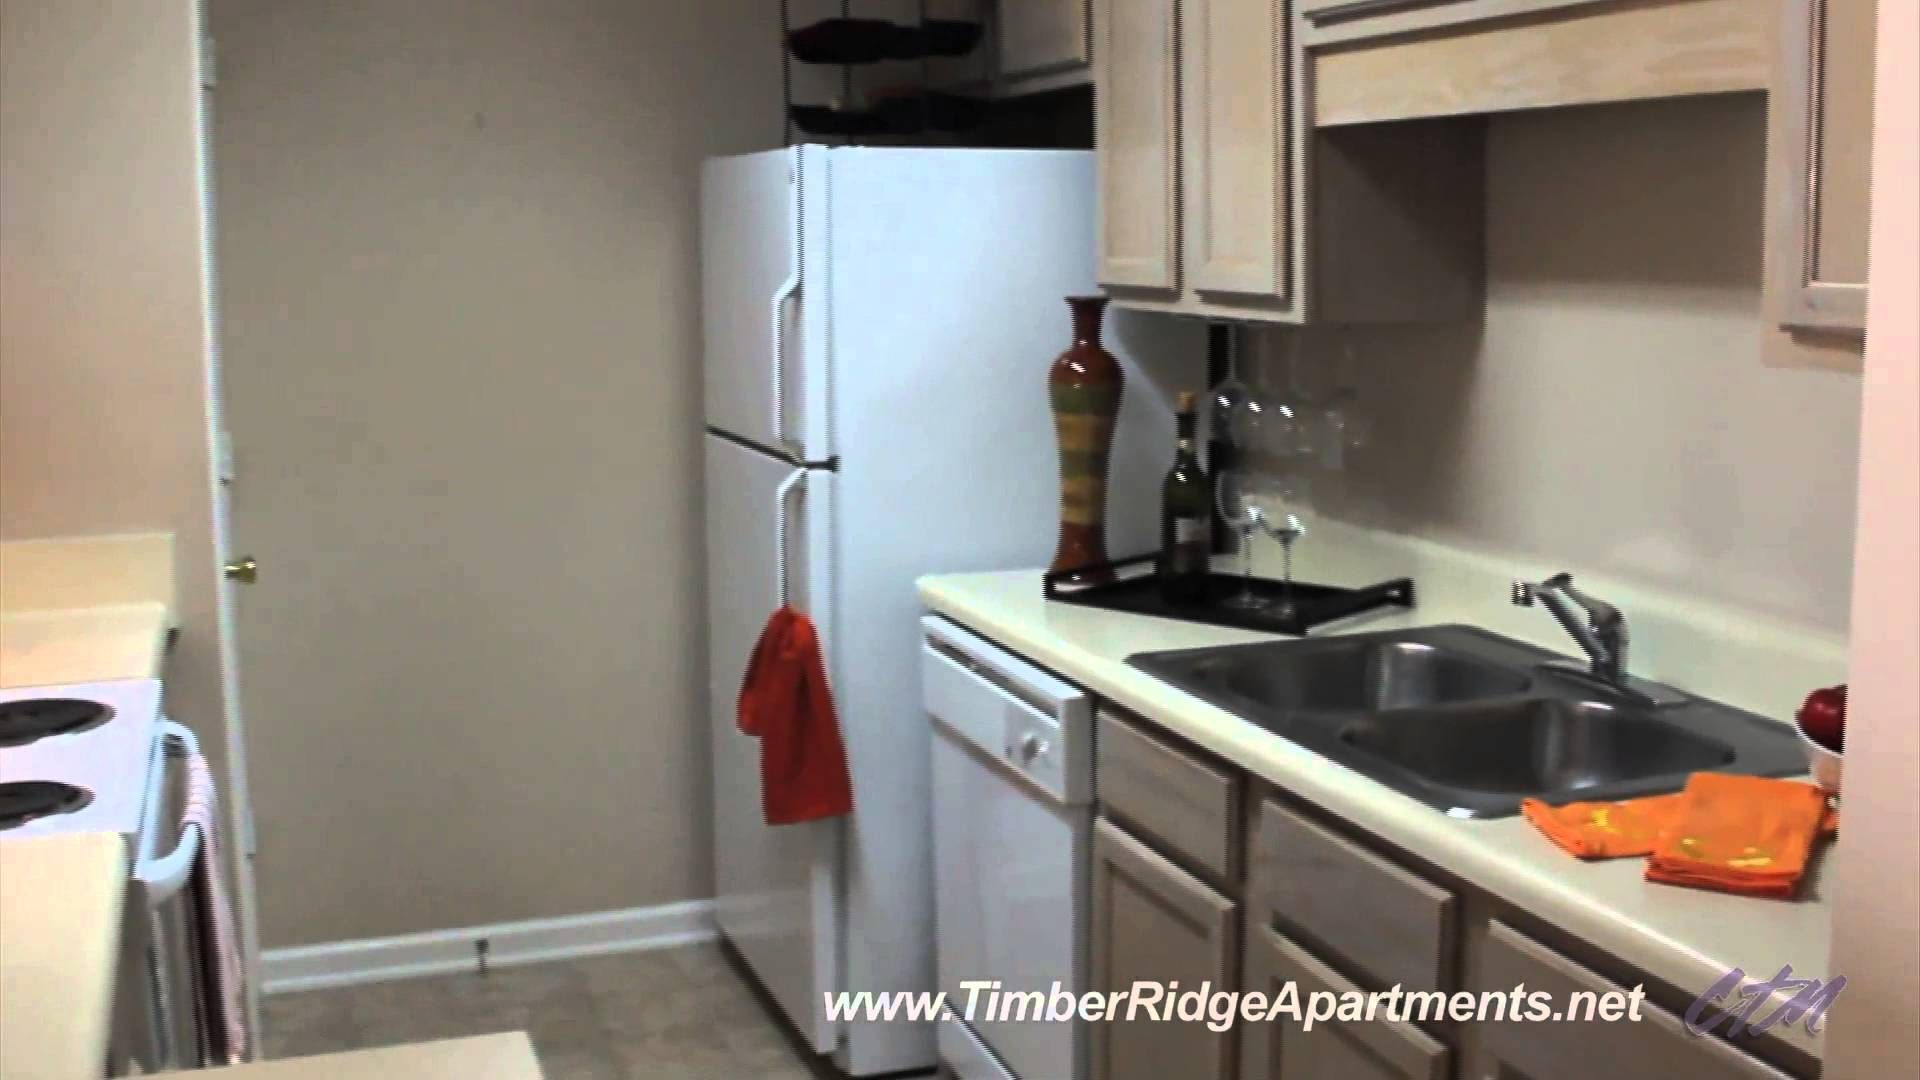 Timber Ridge Apartments 2 Bedroom 2 Baths Walkthrough Mobile Al